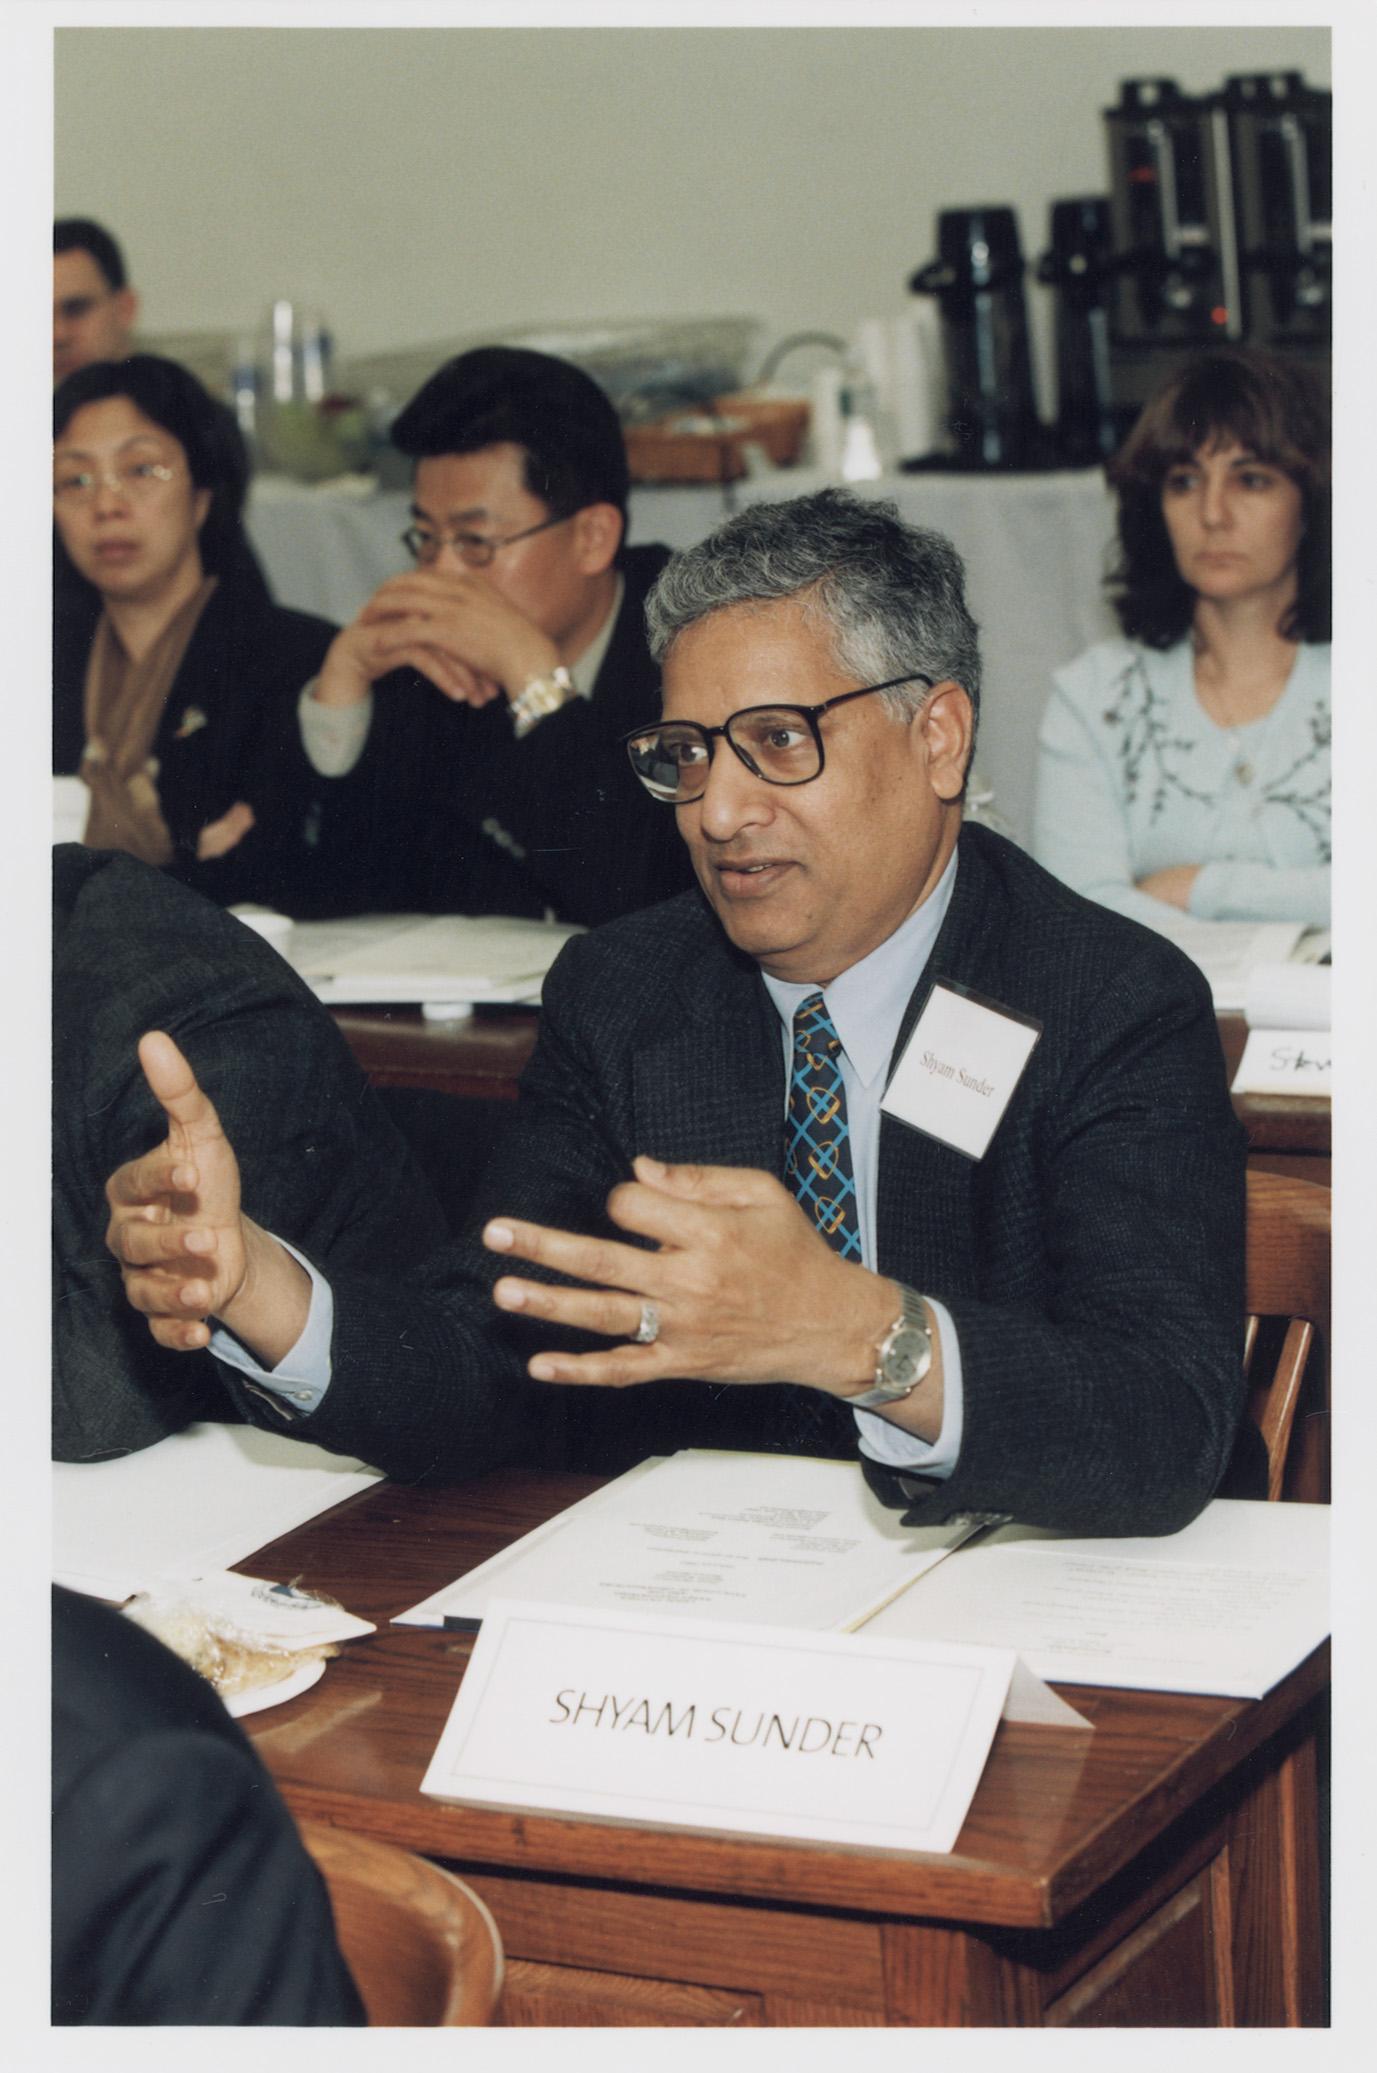 Yale SOM Prof. Shyam Sunder